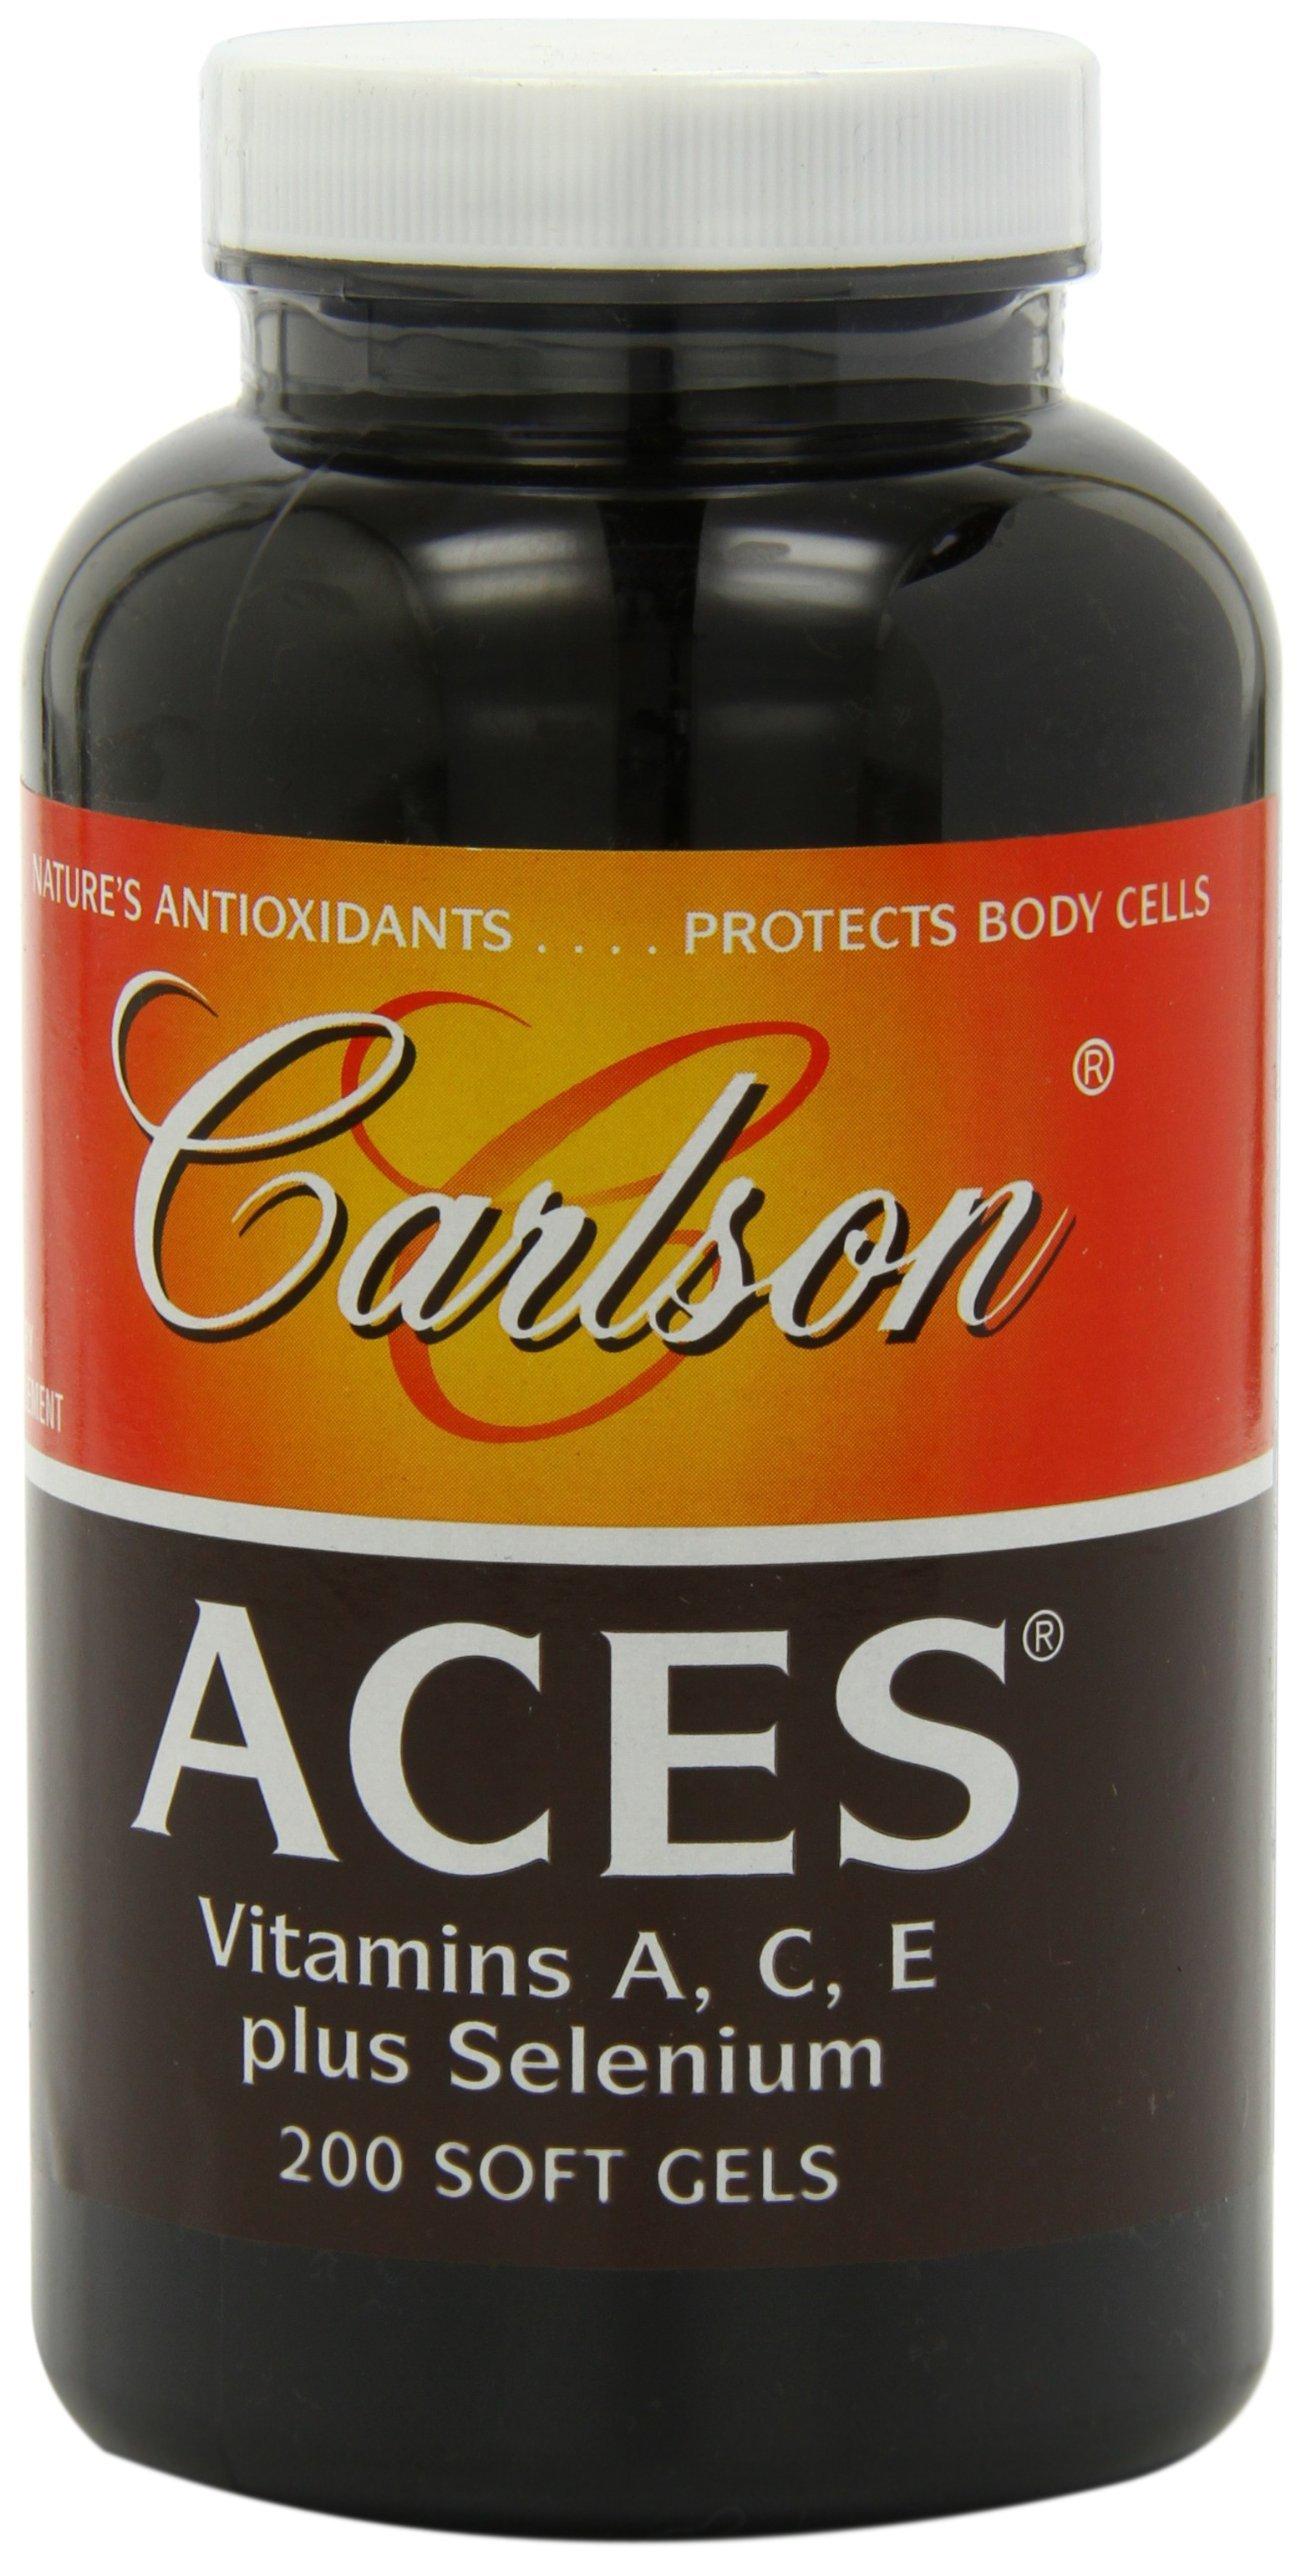 Carlson Aces Antioxidant Formula, 200 Softgels